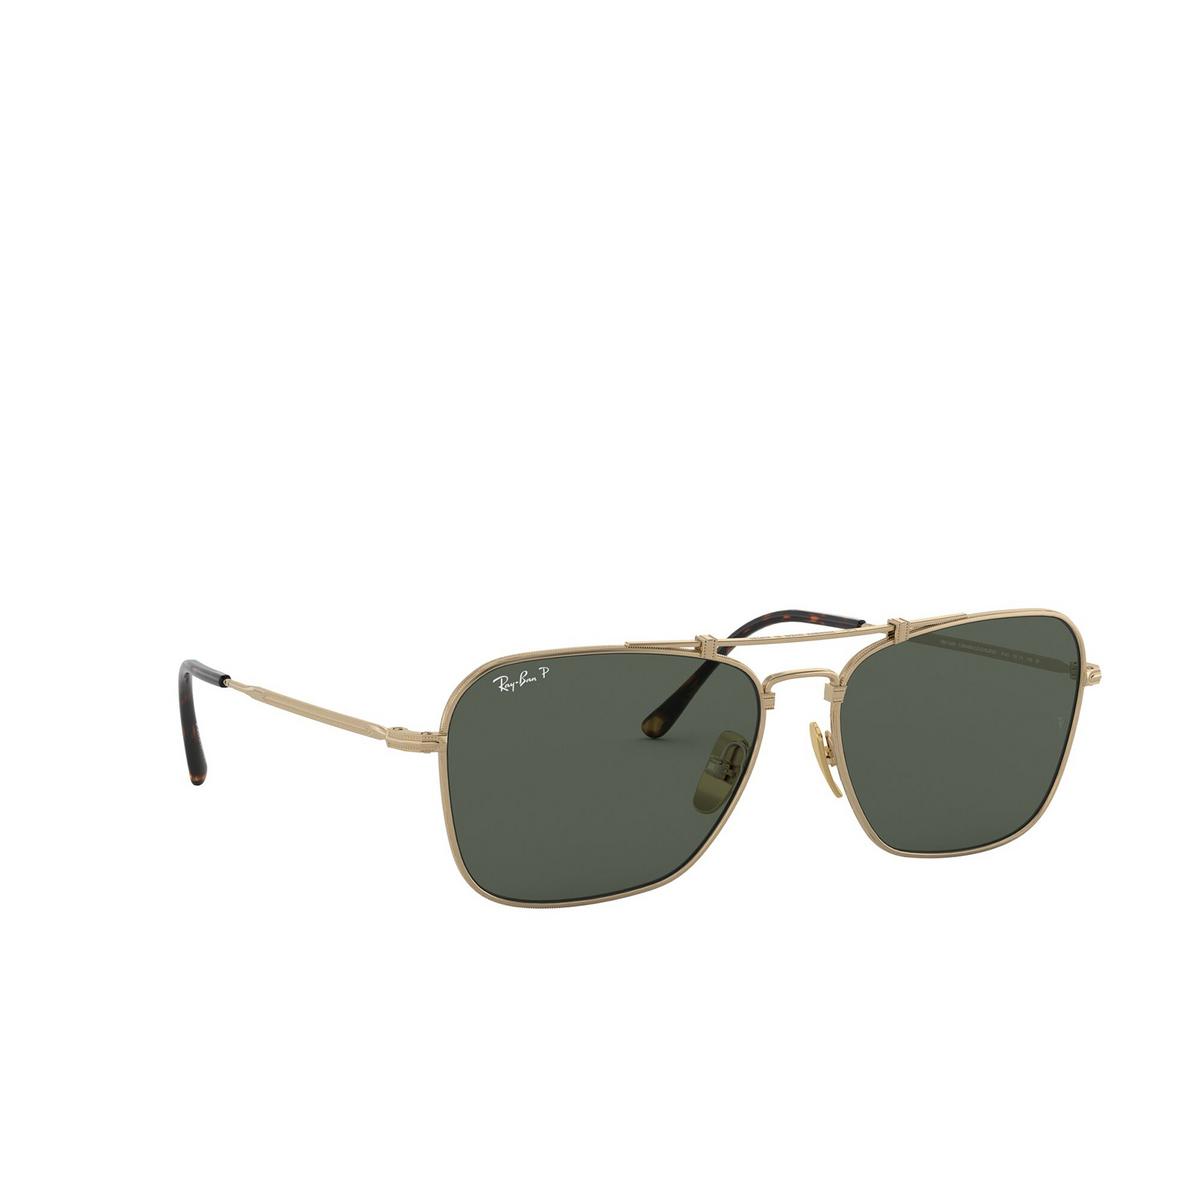 Ray-Ban® Square Sunglasses: Titanium RB8136M color Demi Gloss White Gold 9143 - three-quarters view.